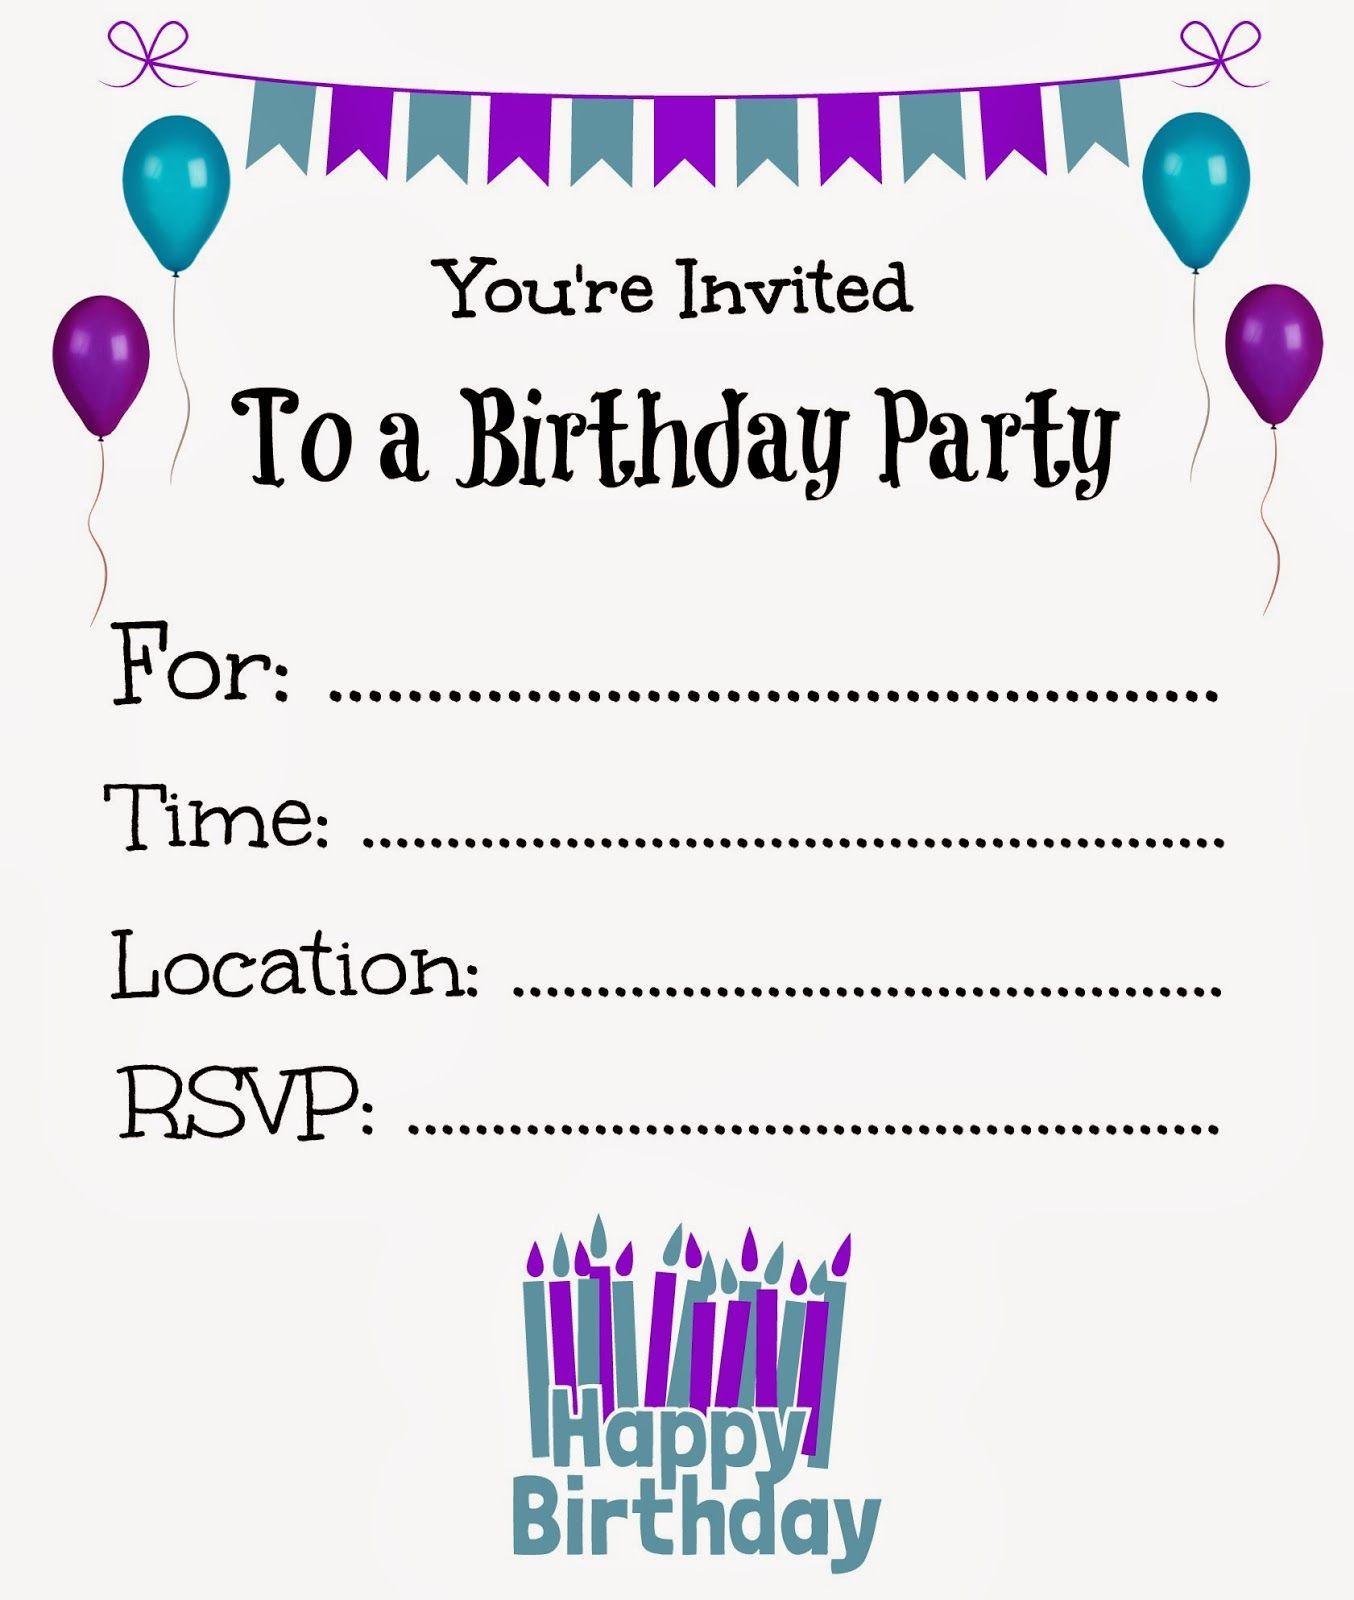 Free Printable Birthday Invitations For Kids #freeprintables - Free Printable Toddler Birthday Invitations